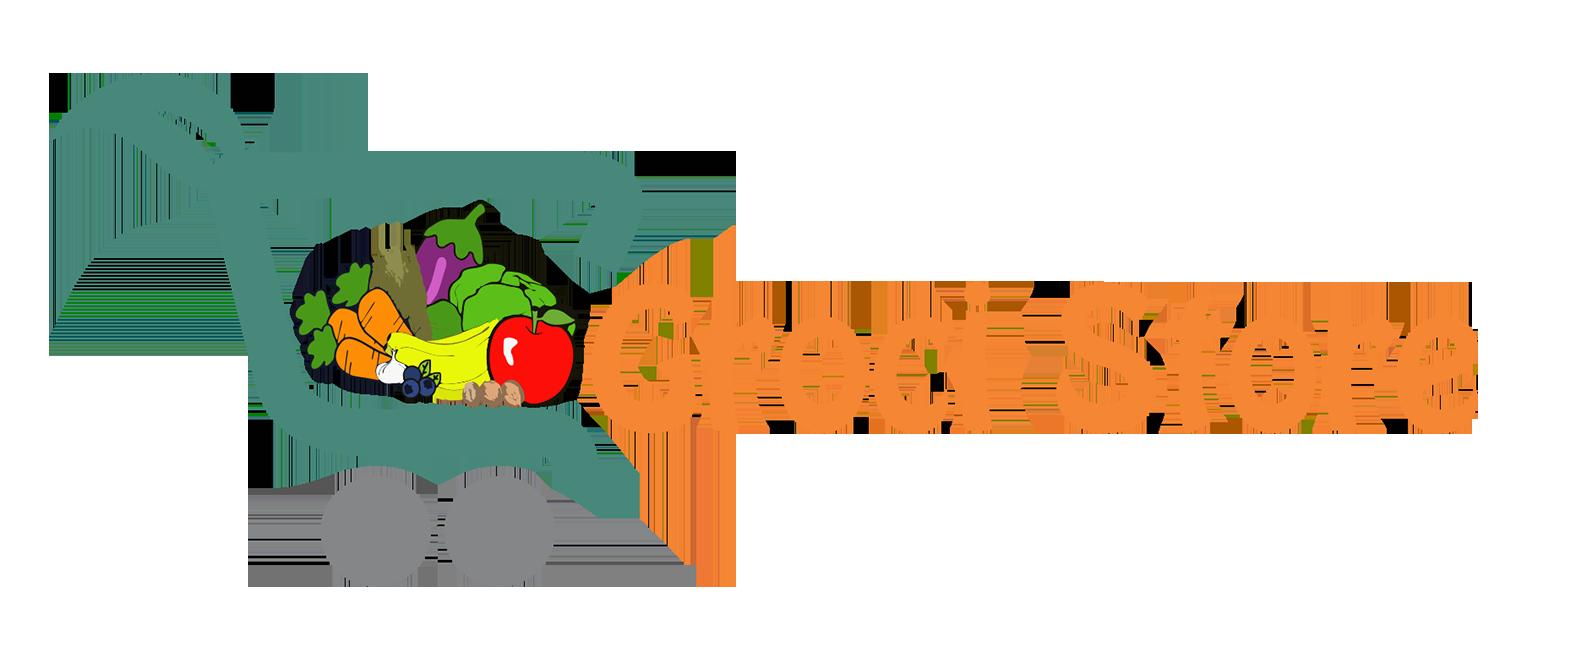 Grocistore